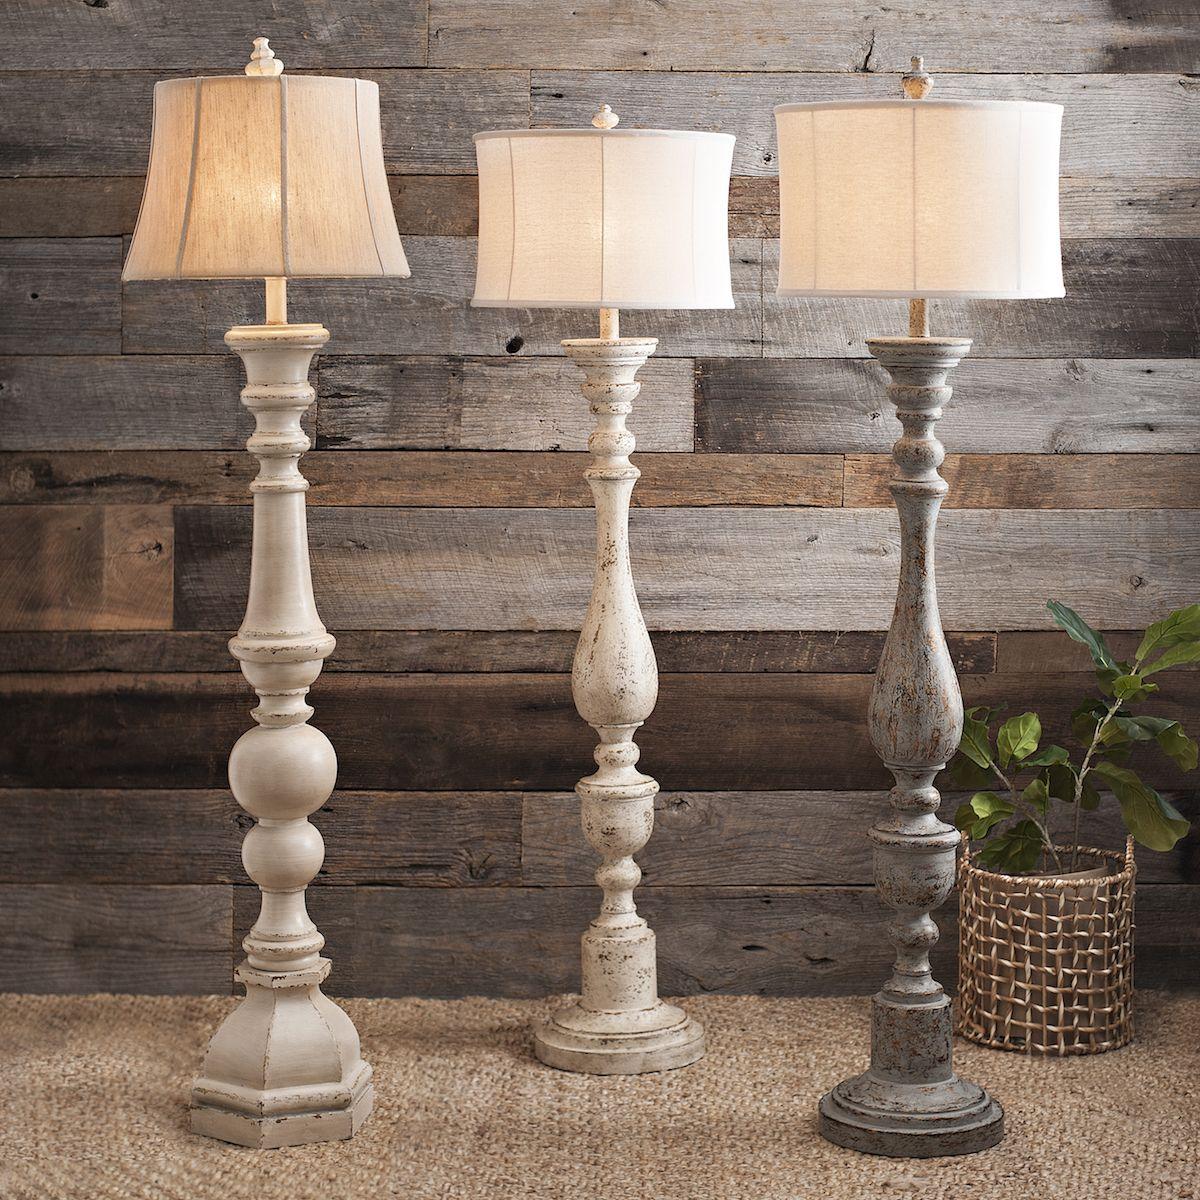 Freshen Up Your Space With A Fabulous Floor Lamp Farmhouse Floor Lamps Wood Floor Lamp Diy Floor Lamp